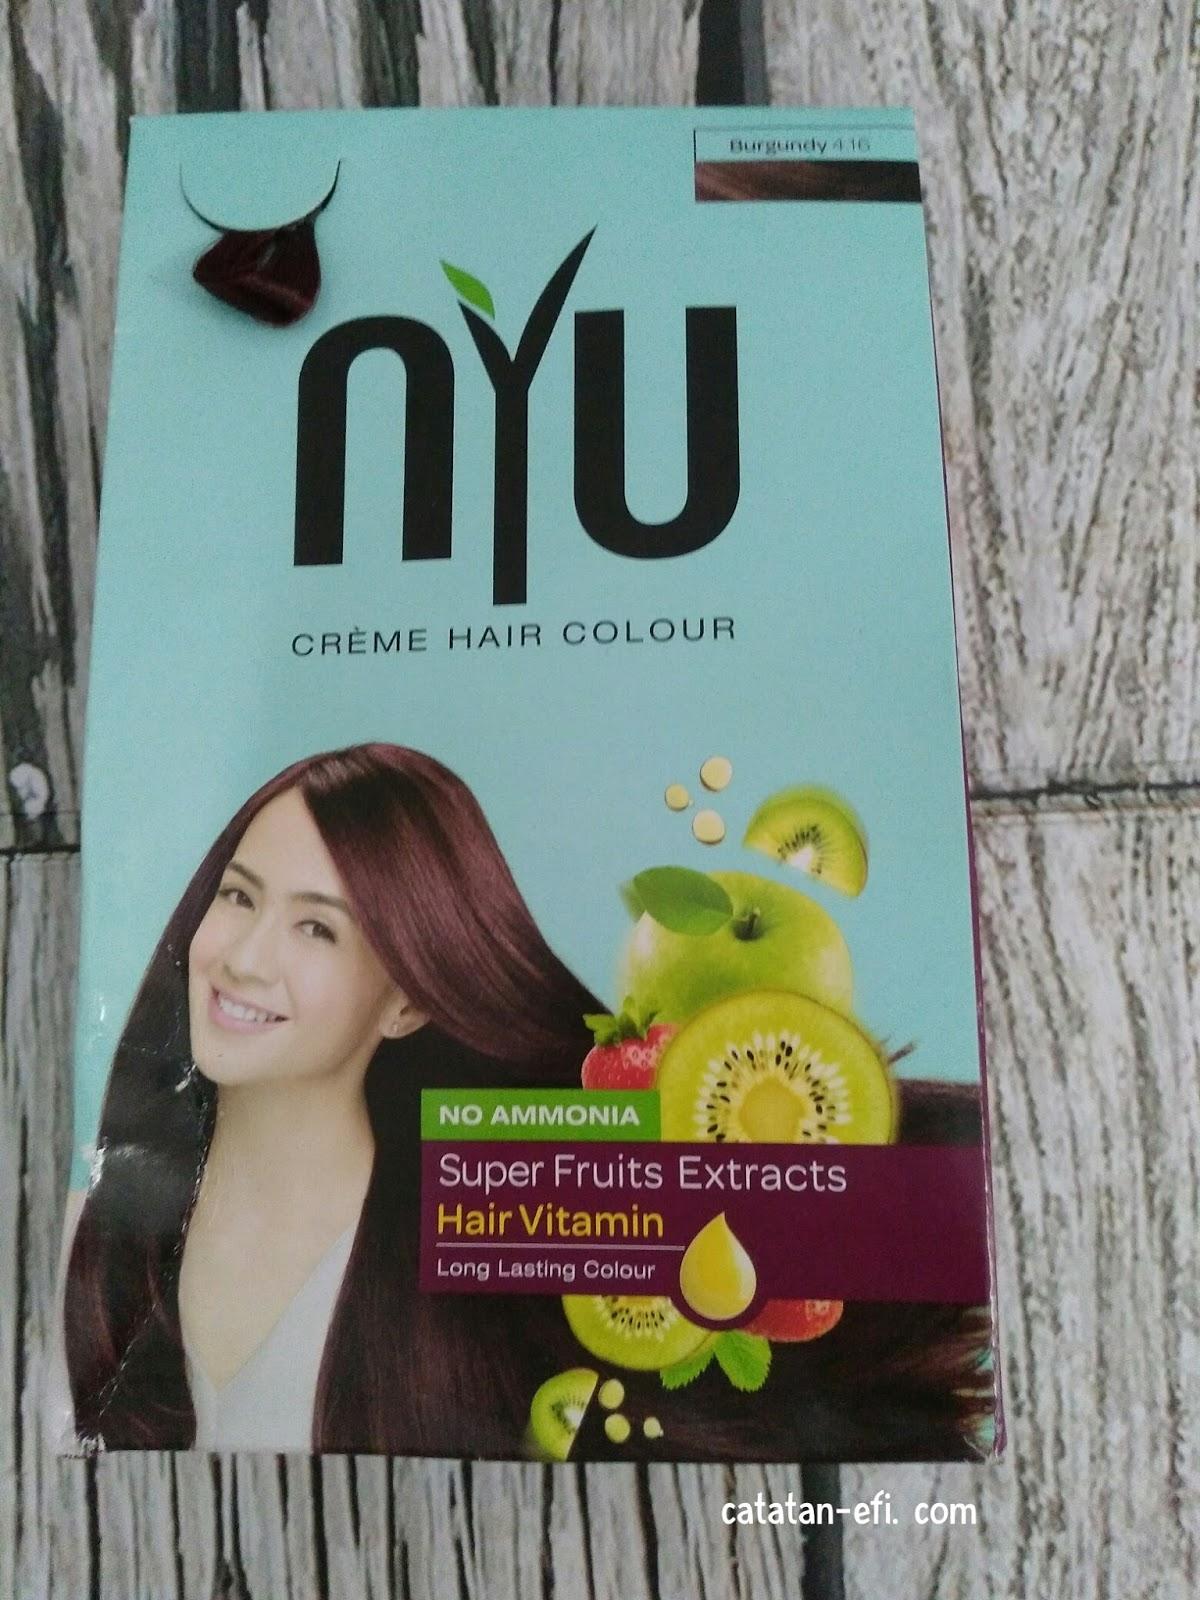 Unboxing Nyu Crme Hair Colour Catatan Efi Sisir Cat Semir Rambut Beberapa Hari Yang Lalu Saya Mencoba Pewarna Ternyata Wanginya Enak Banget Lho Aromanya Fruity Buah Buahan Segar Bikin Lapar